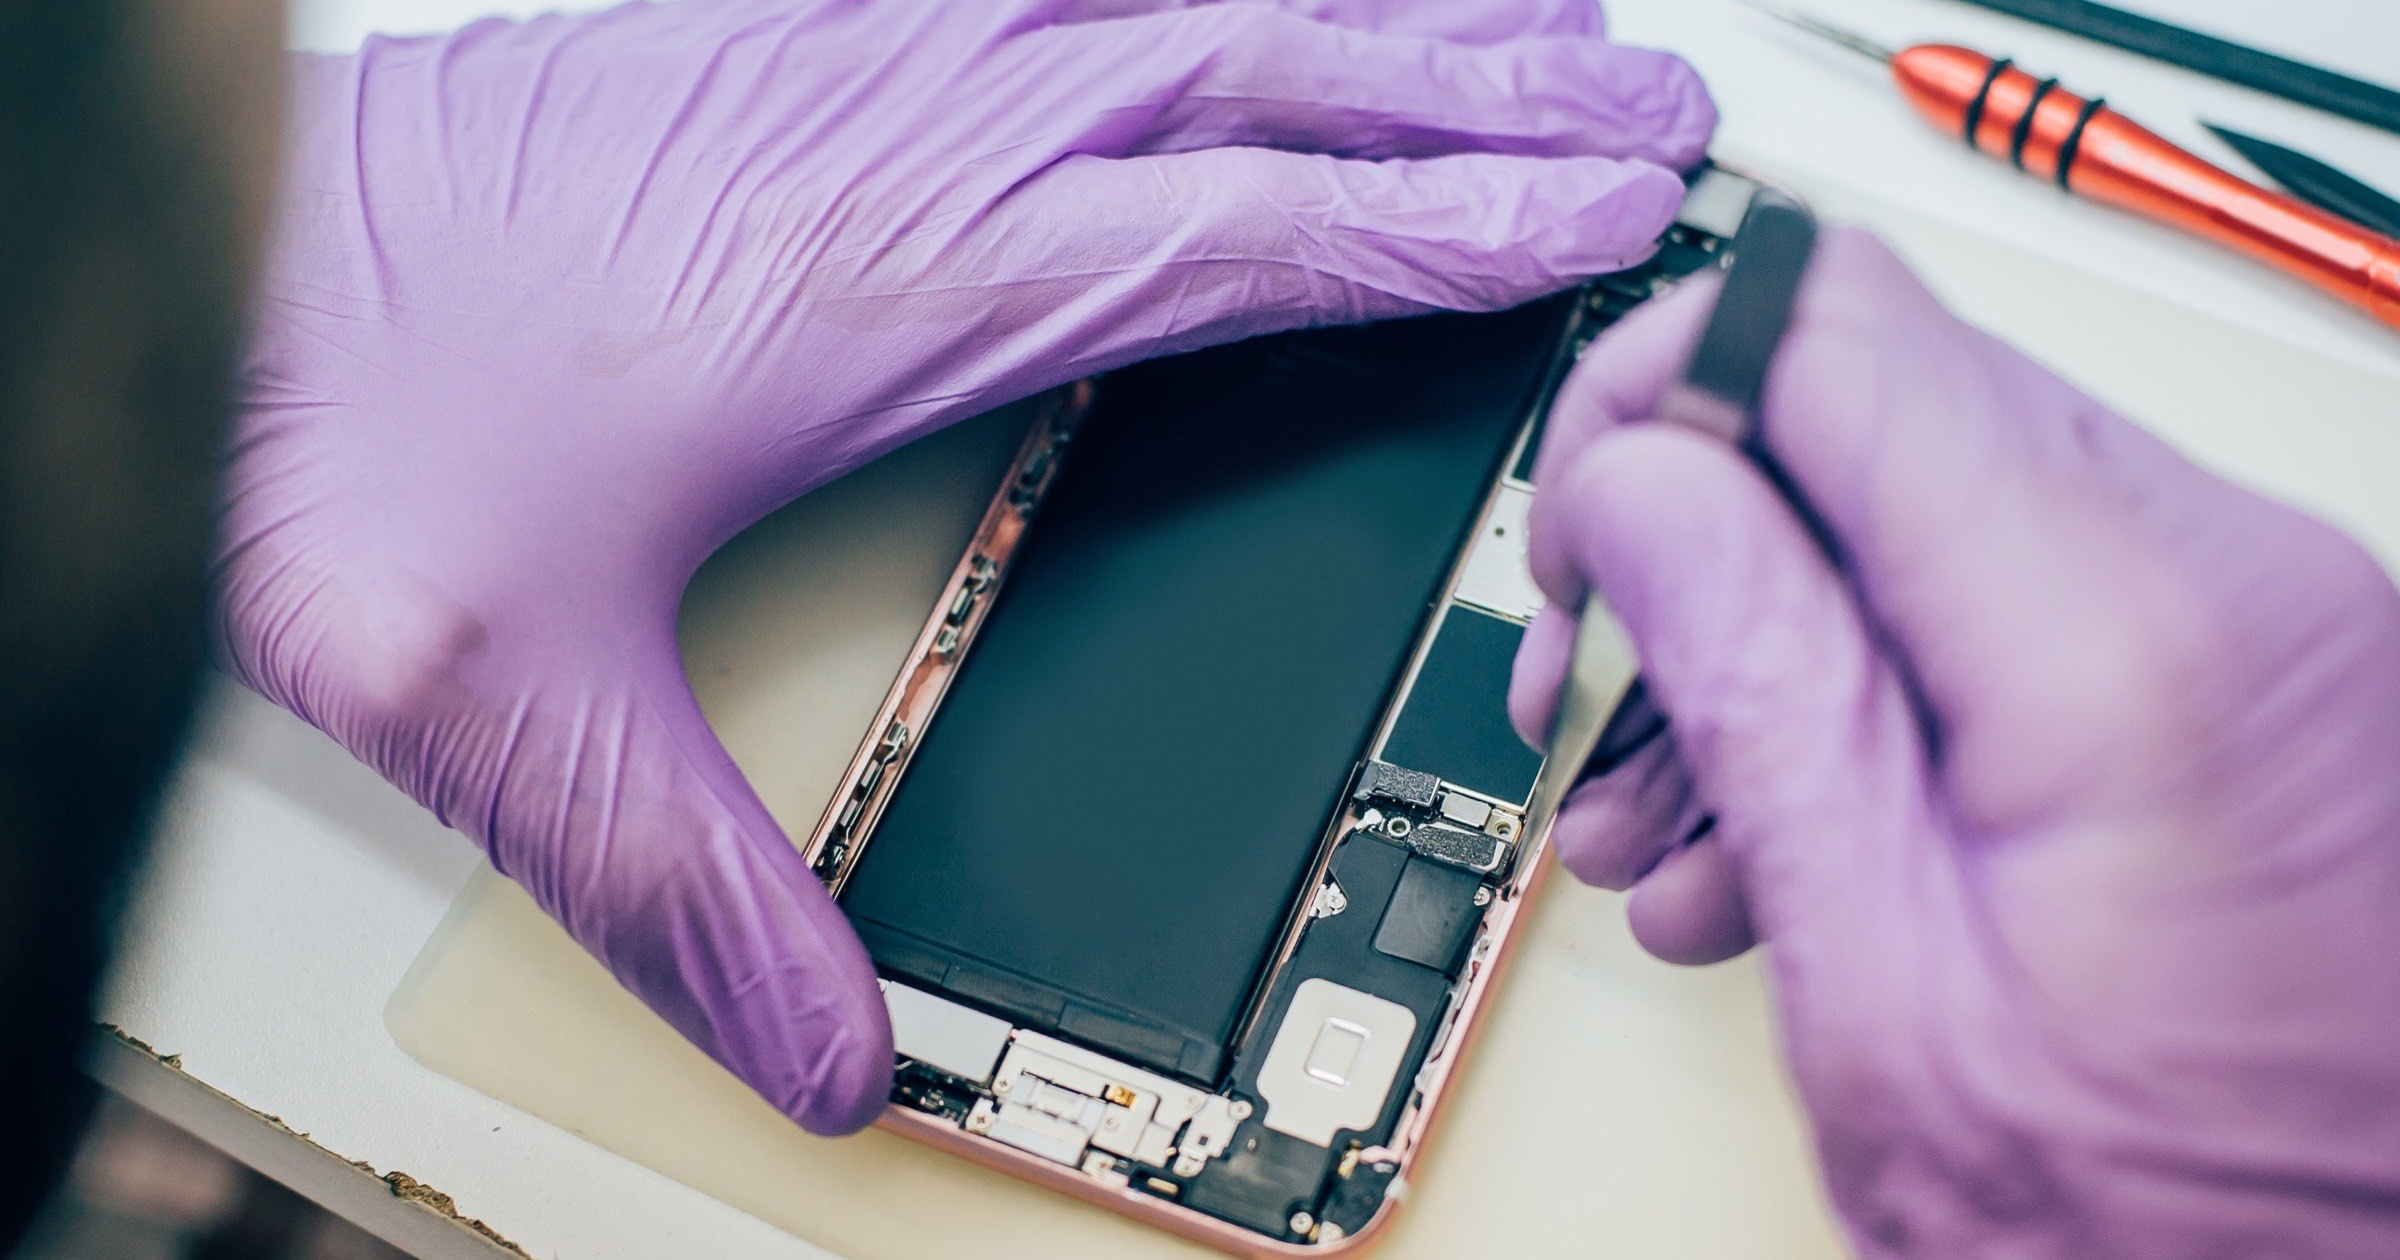 Technician repairs smartphone